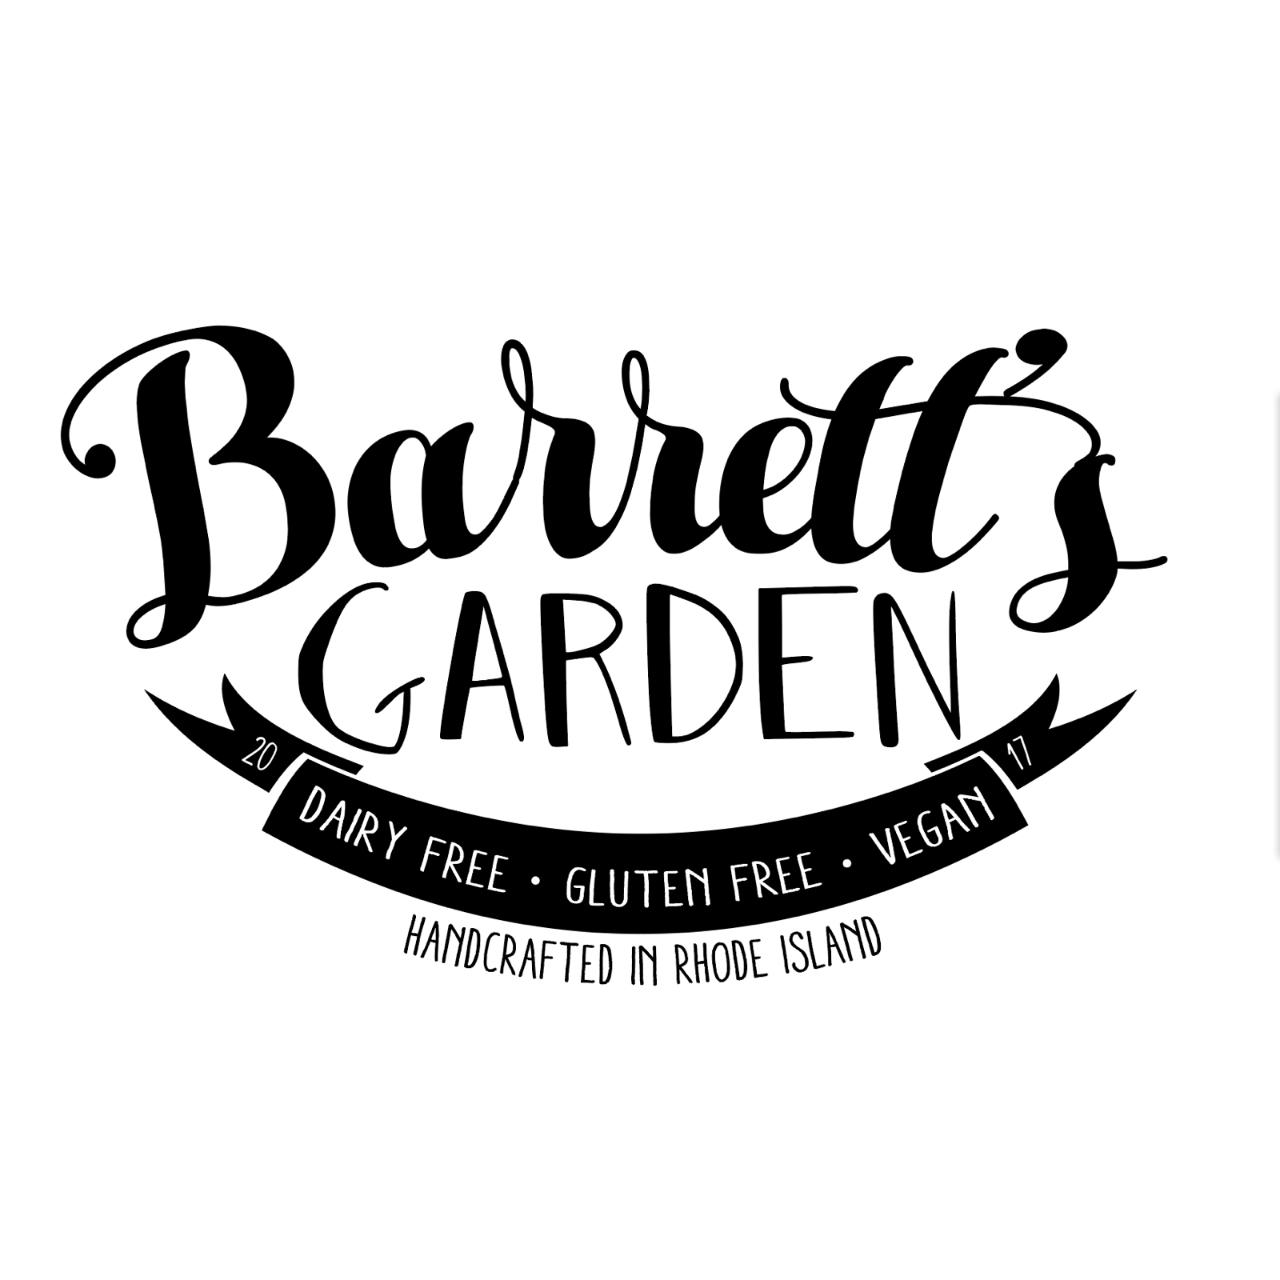 barretts-garden_Logo_Square.jpeg